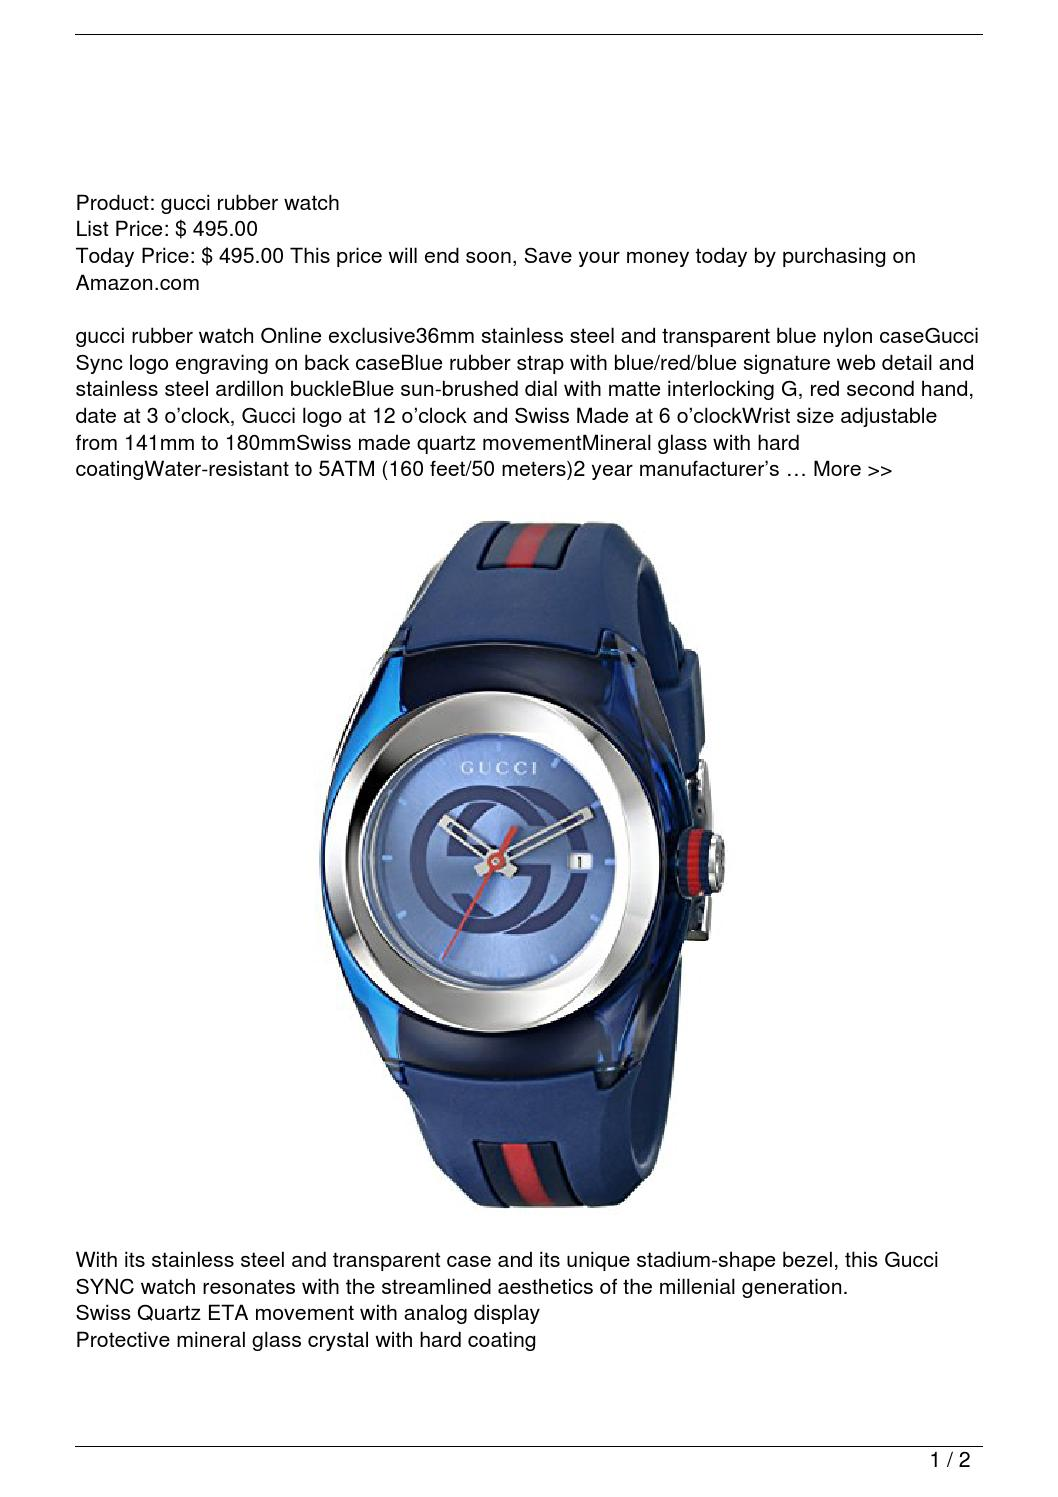 779e1e9c976 Gucci SYNC L YA137304 Watch Watch Reviews by khanh - issuu